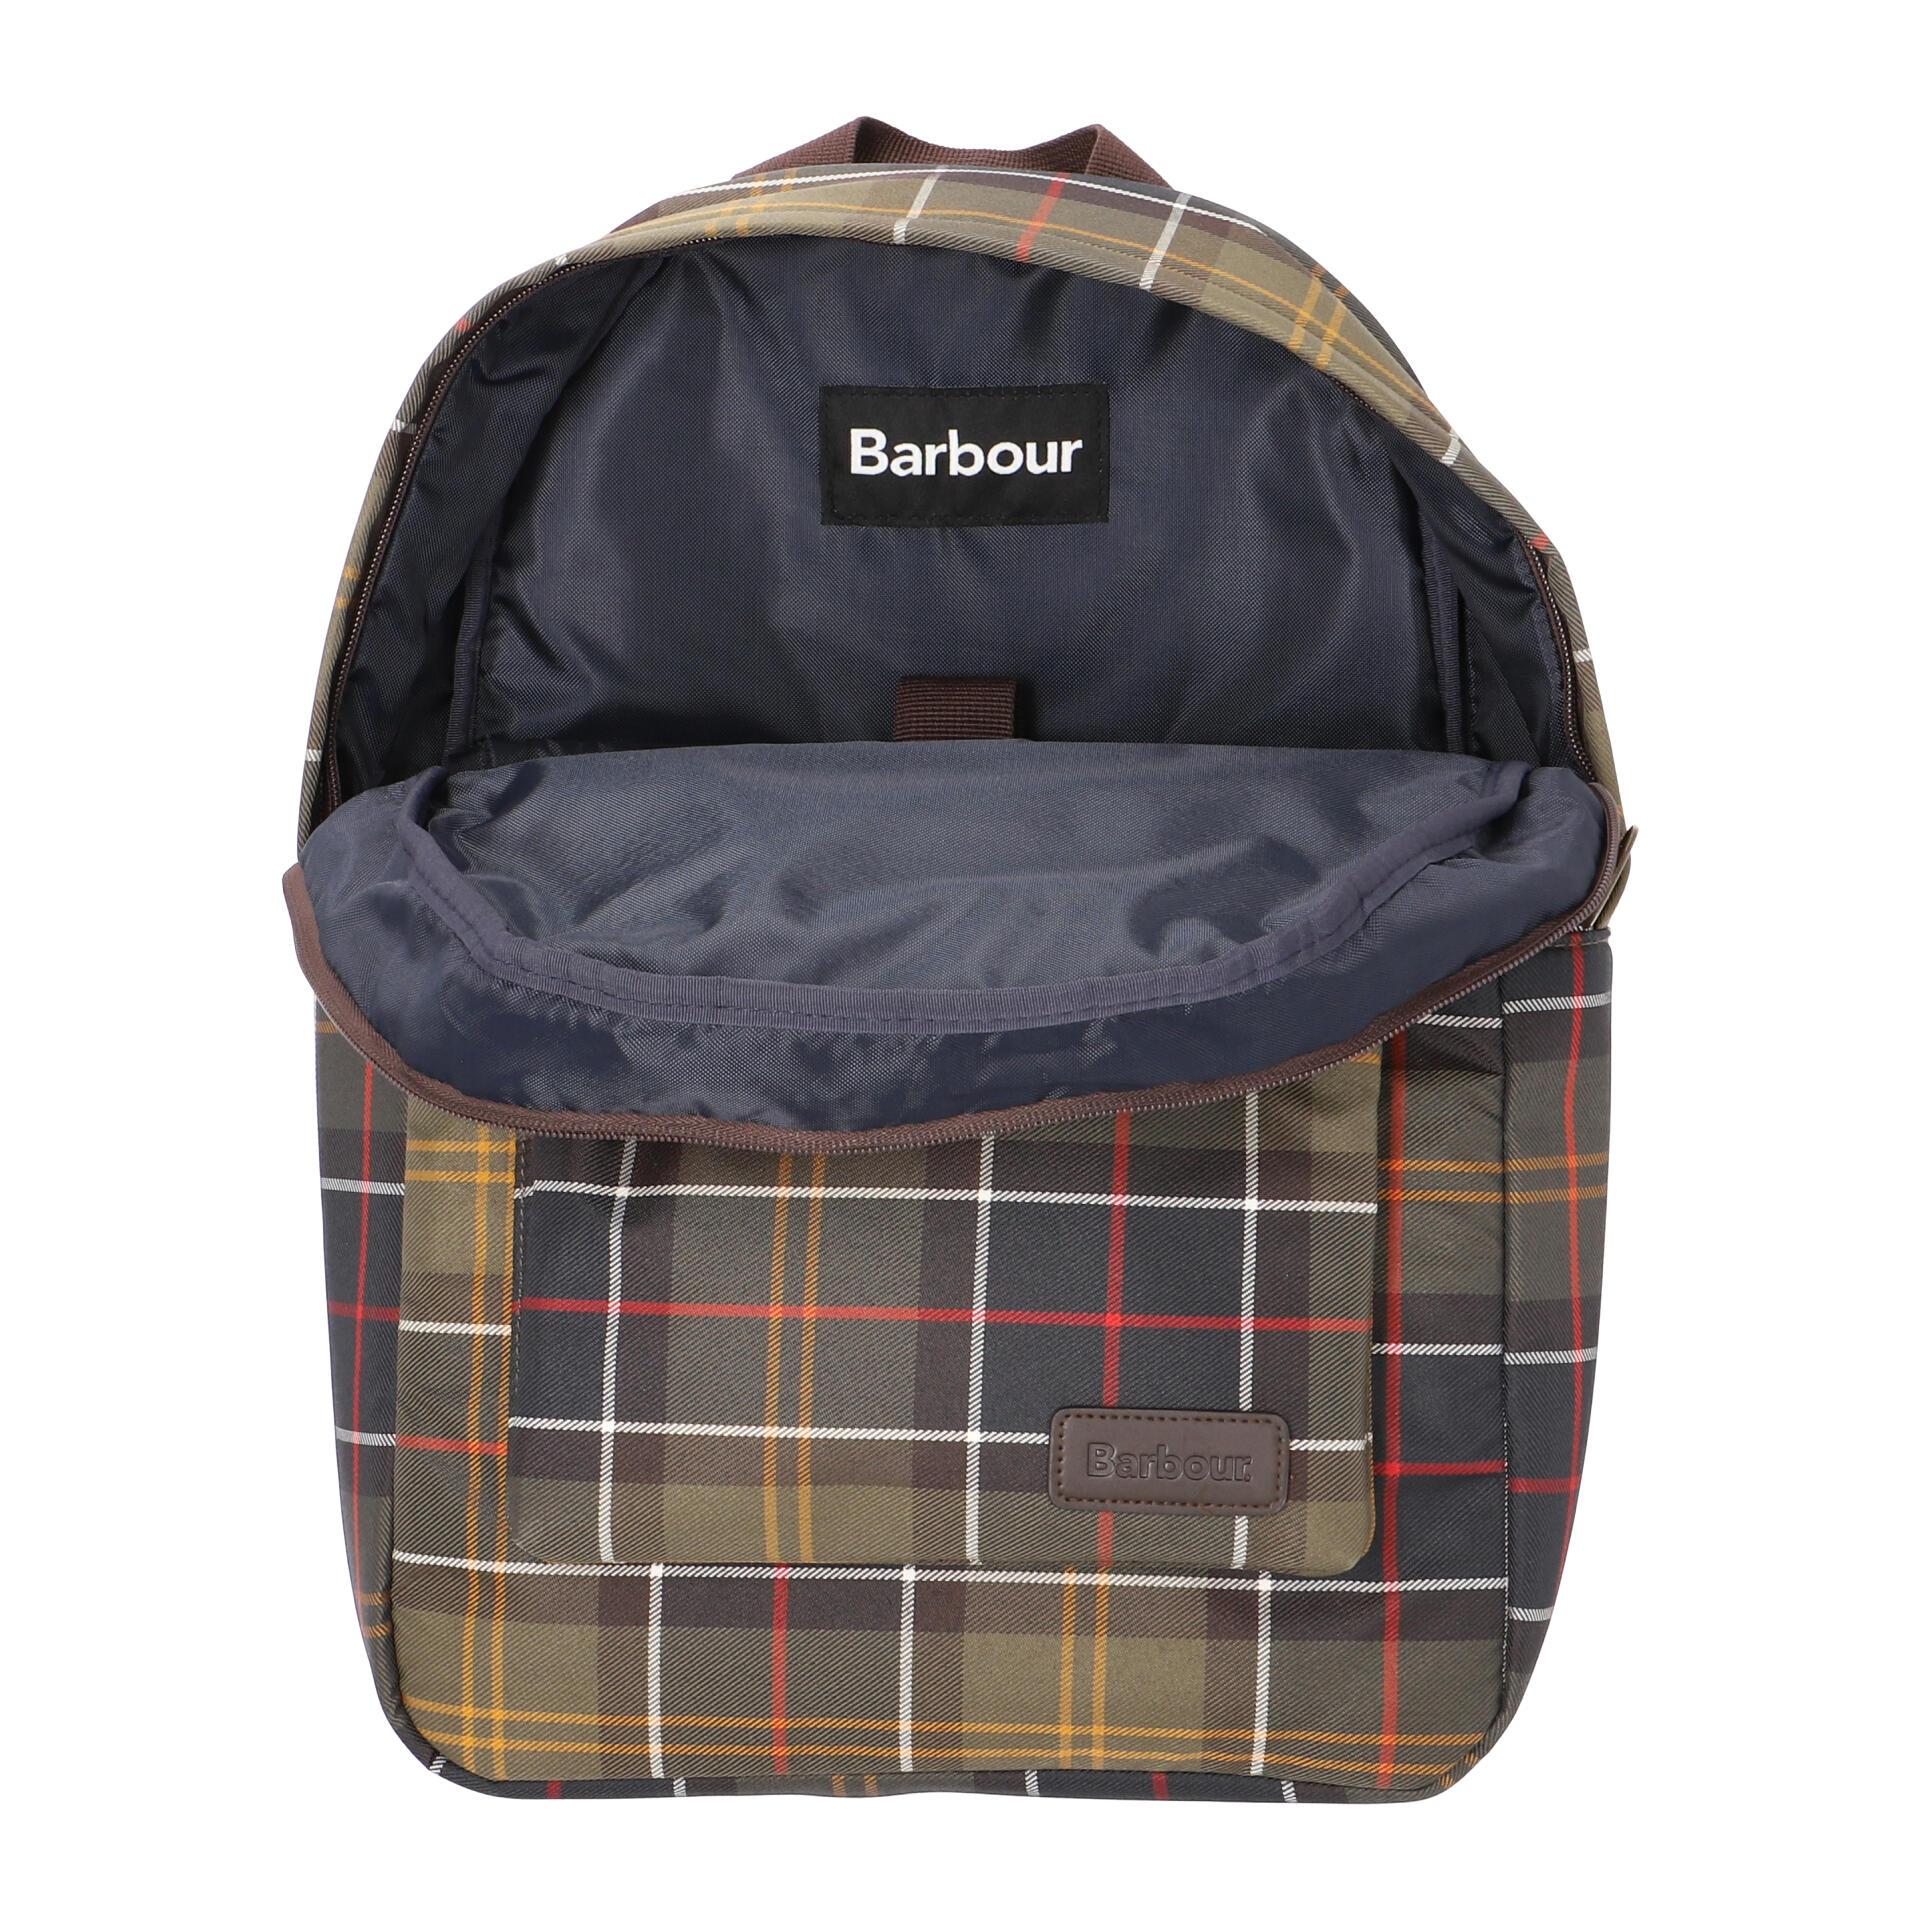 Barbour Torridon Tartan Rucksack classic tartan